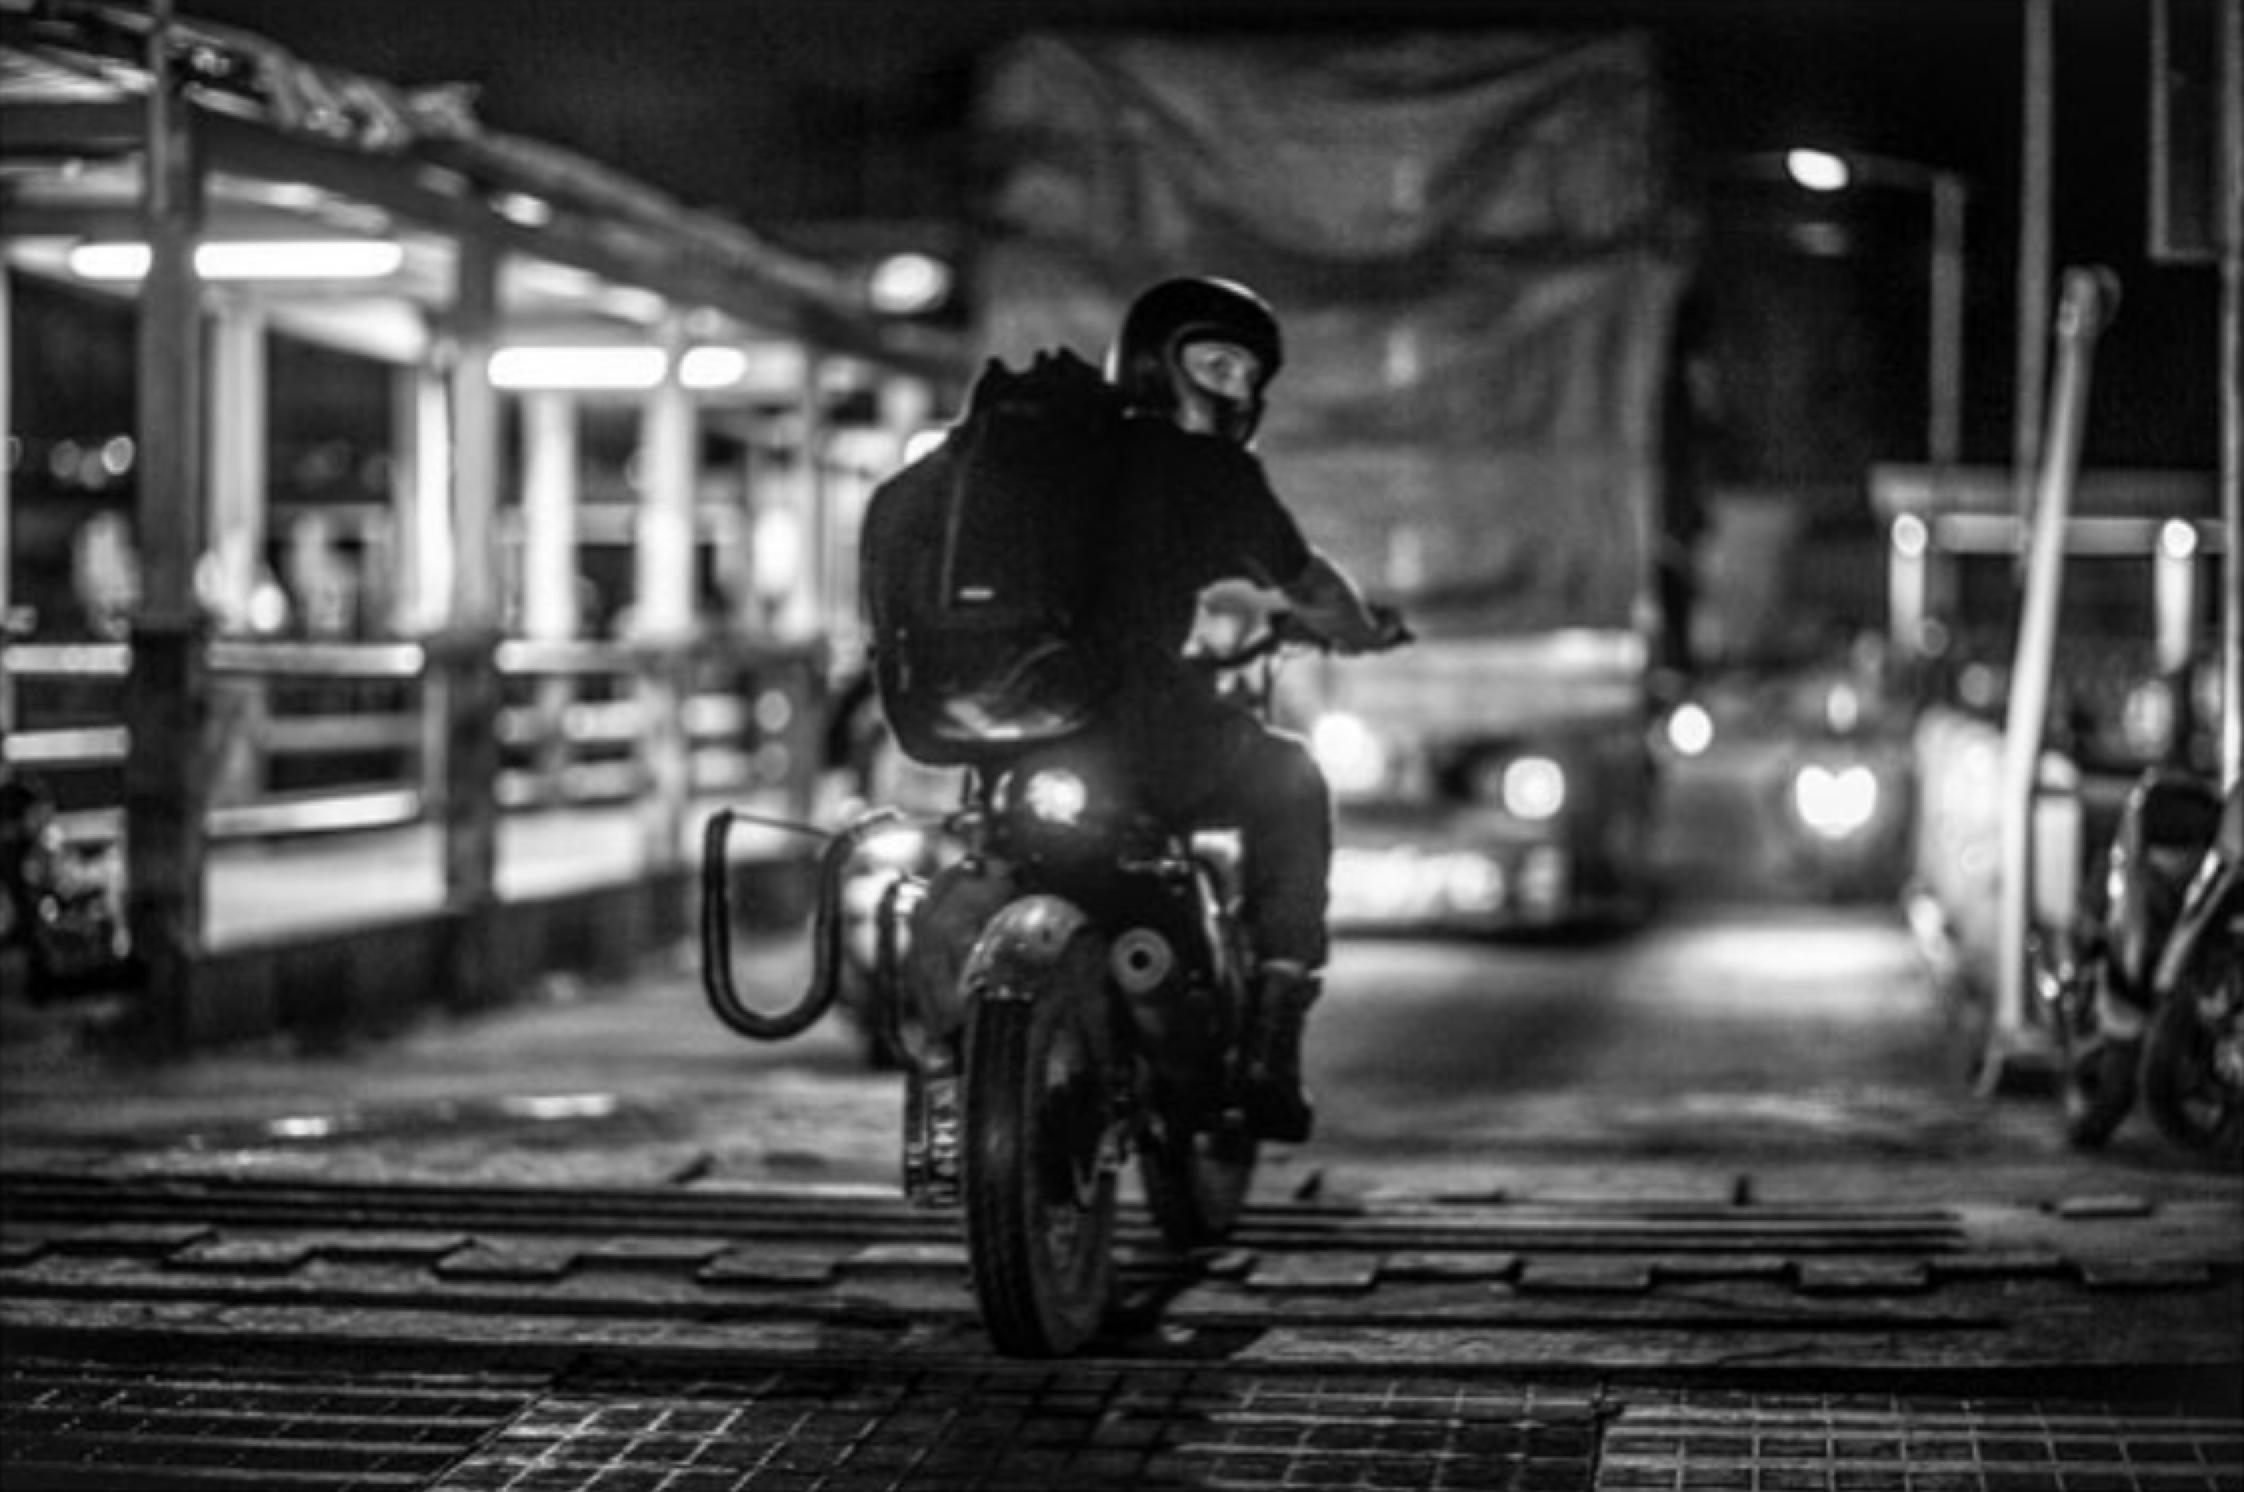 Moto-Enduro006.jpg